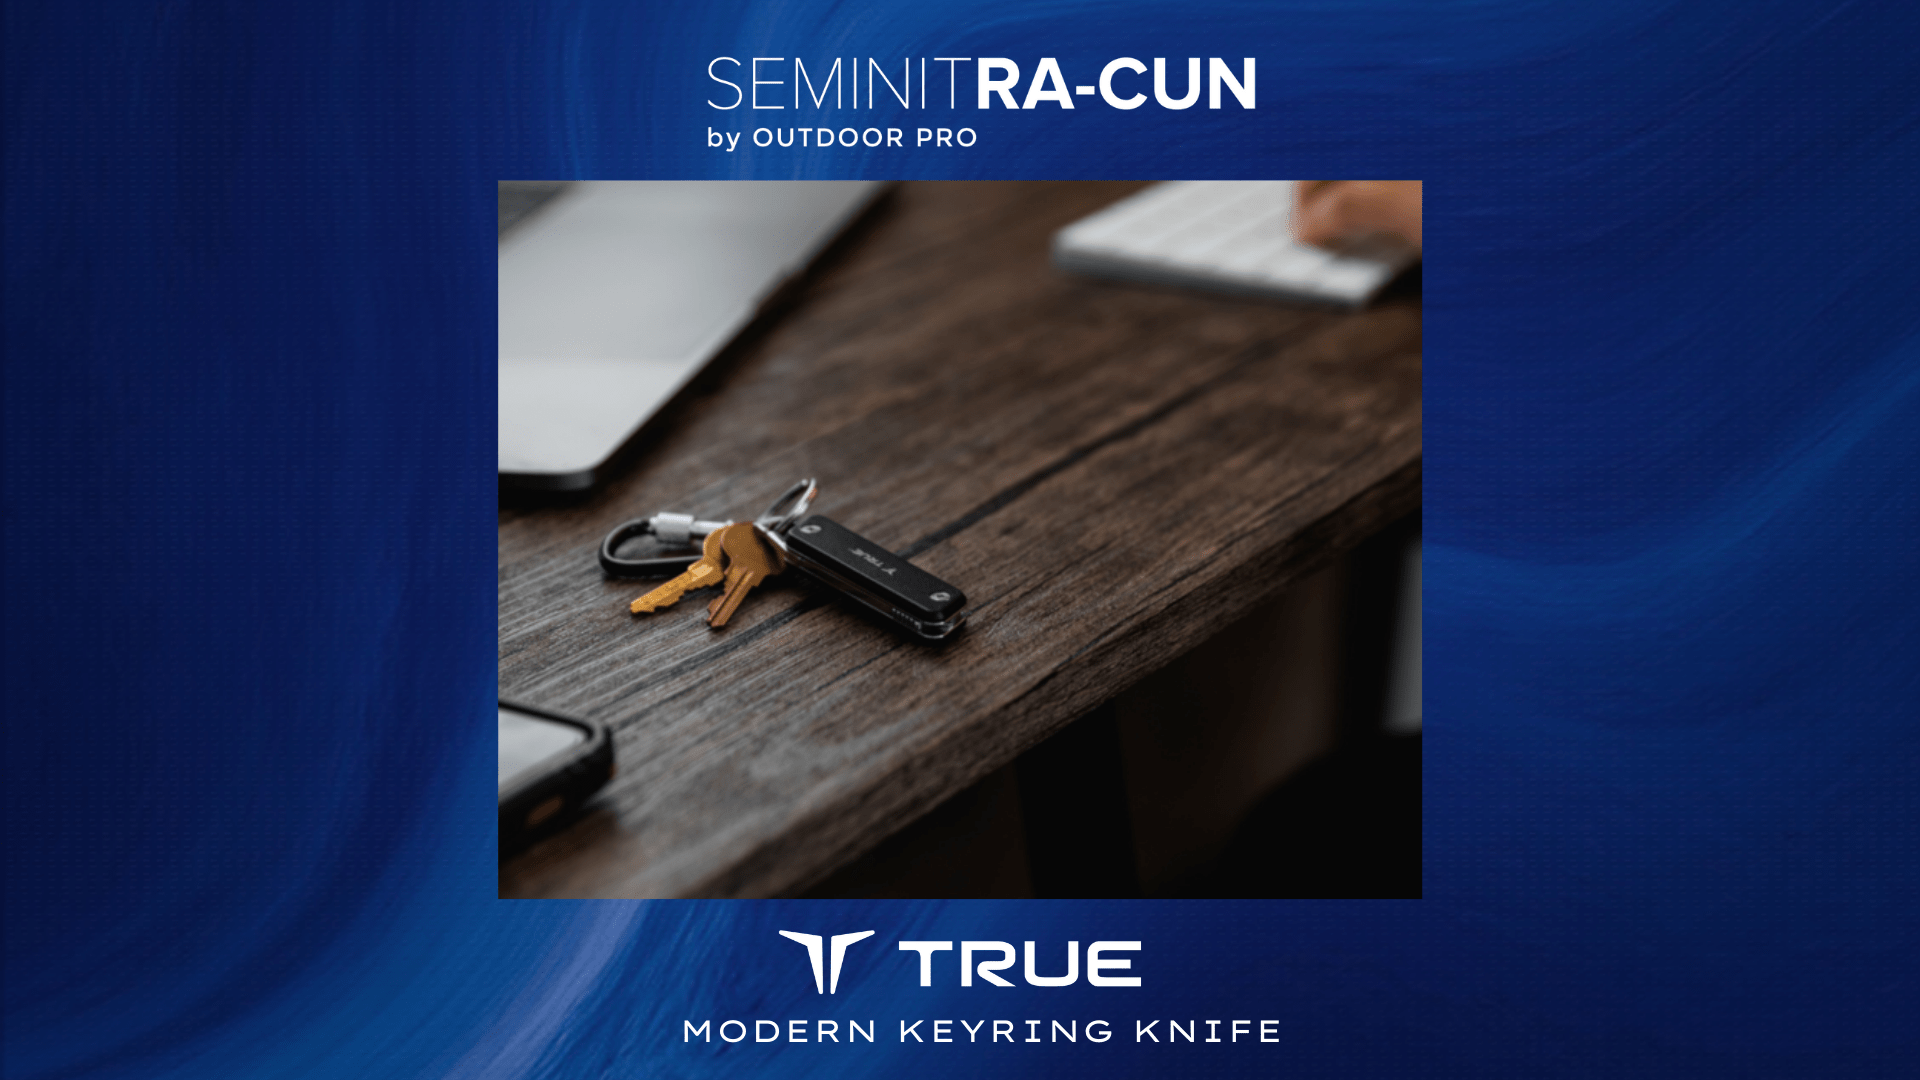 𝗦𝗘𝗠𝗜𝗡𝗜𝗧 𝗥𝗔-𝗖𝗨𝗡 : TRUE UTILITY MODERN KEYRING KNIFE